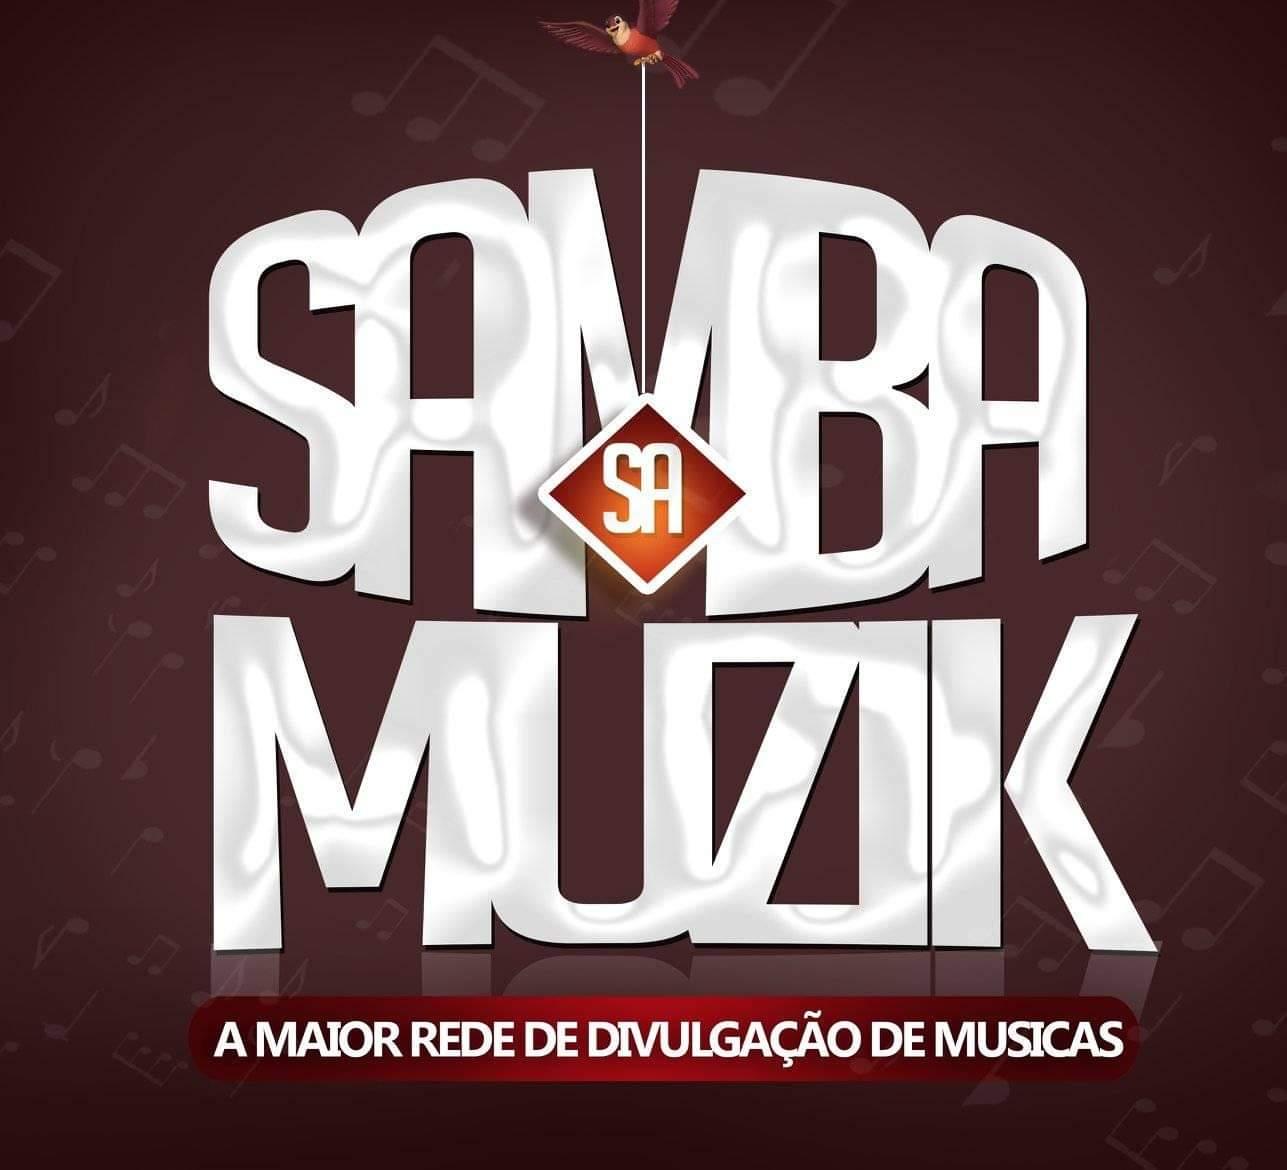 Masta Golar Firme Na Estrada Kuduro Download Mp3 Baixar Musica Baixar Musica De Samba Sa Muzik Musica Nova Kizomba Zouk Afro House Semba